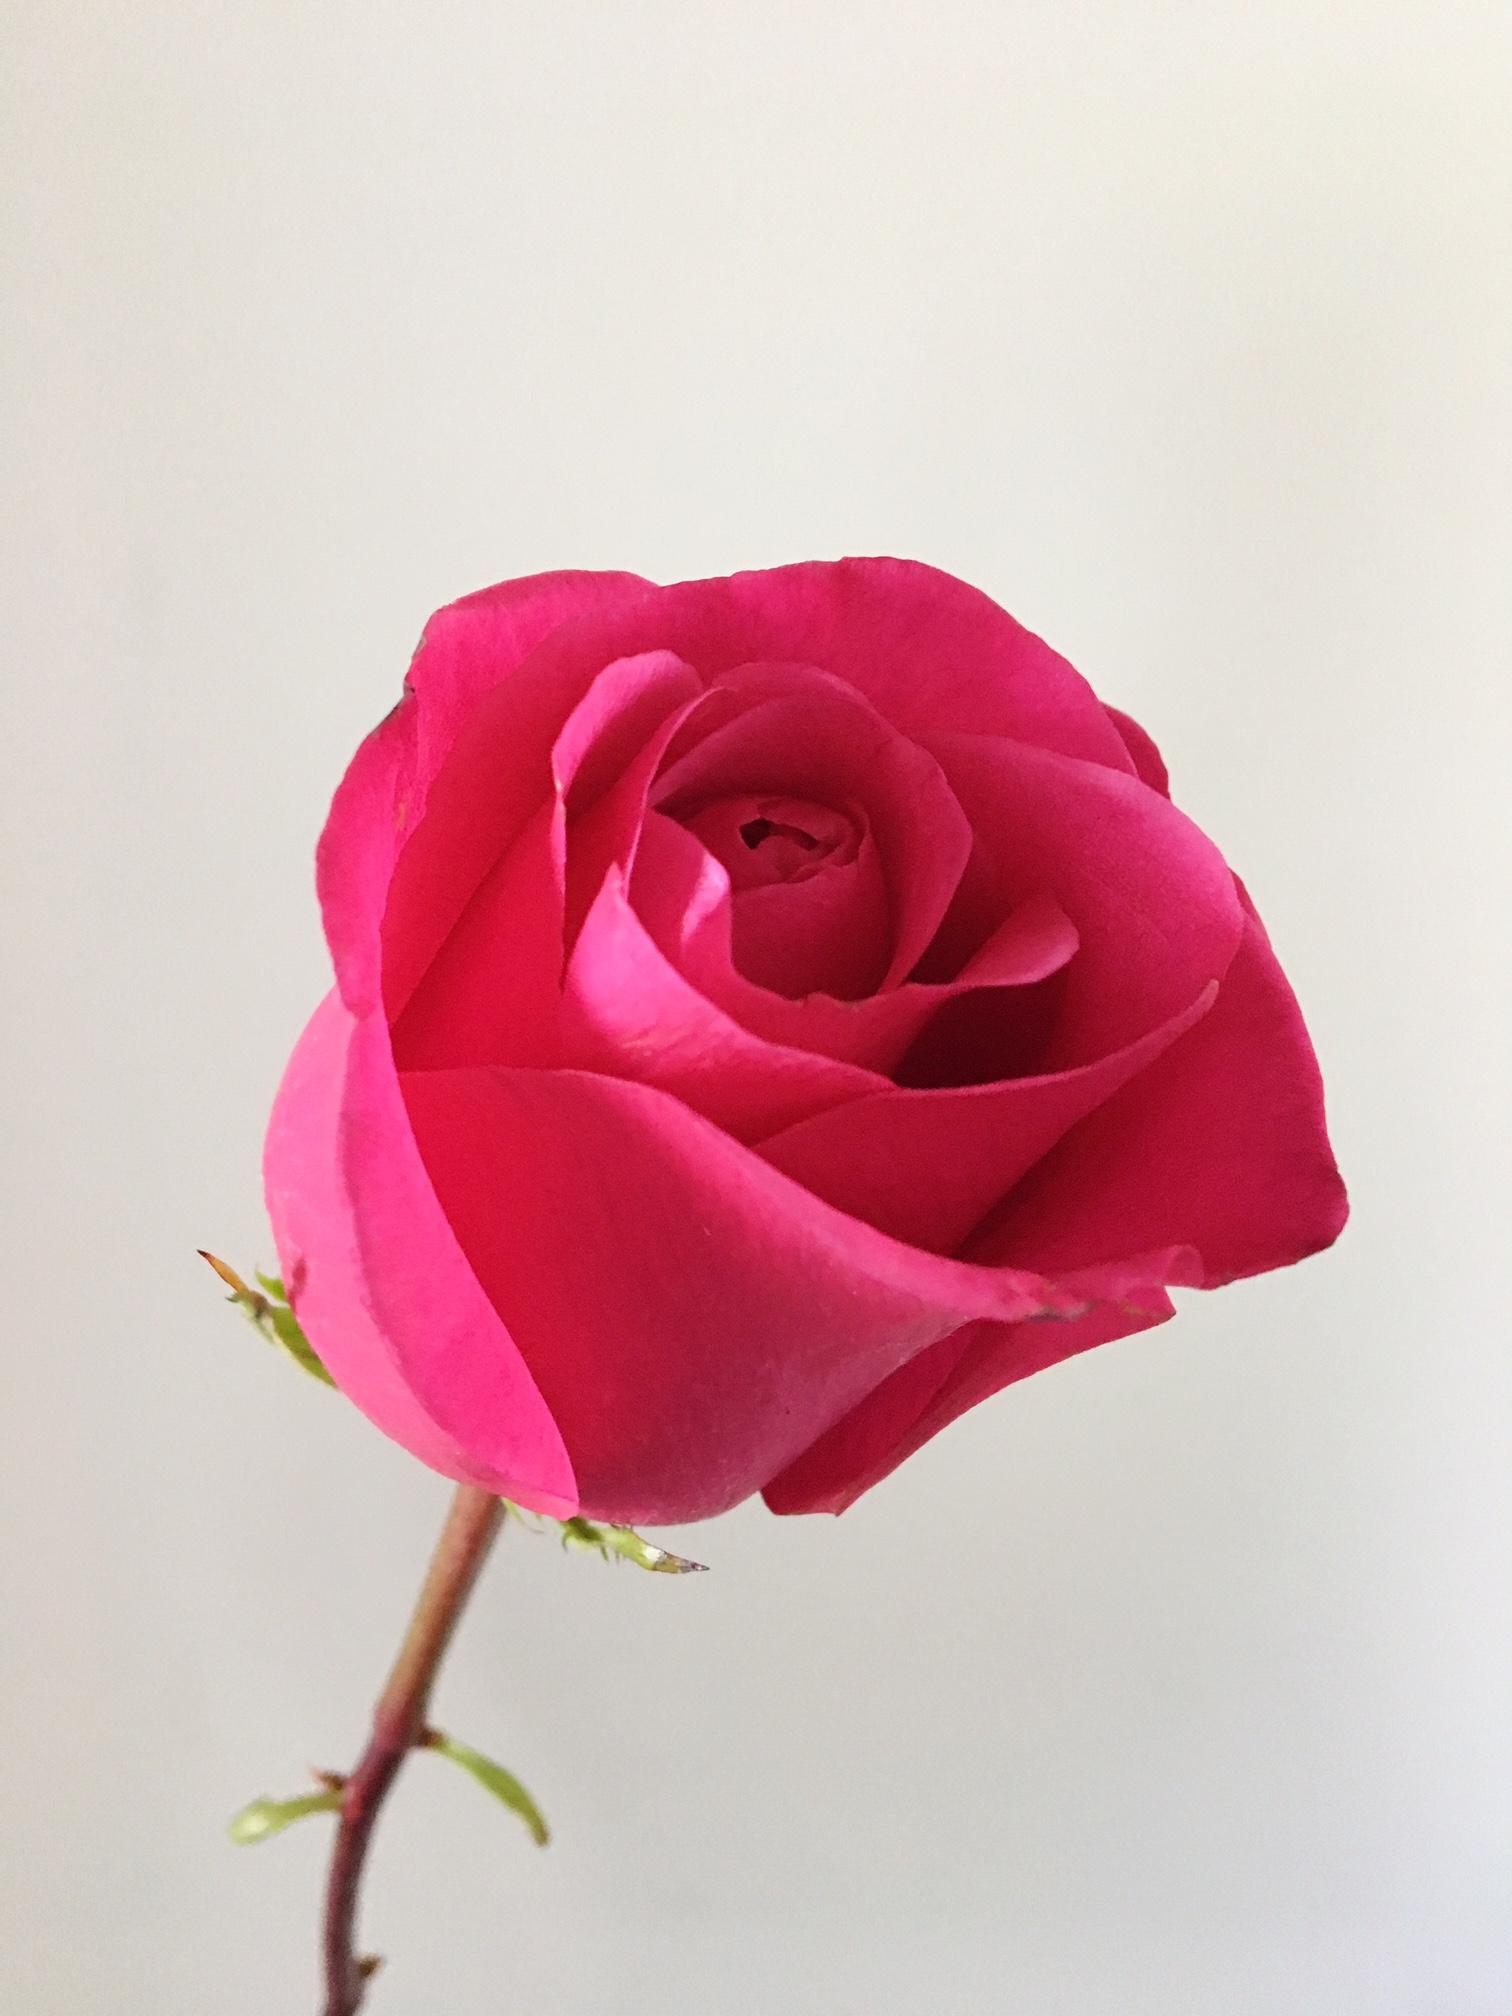 HOT PRINCESS ROSE